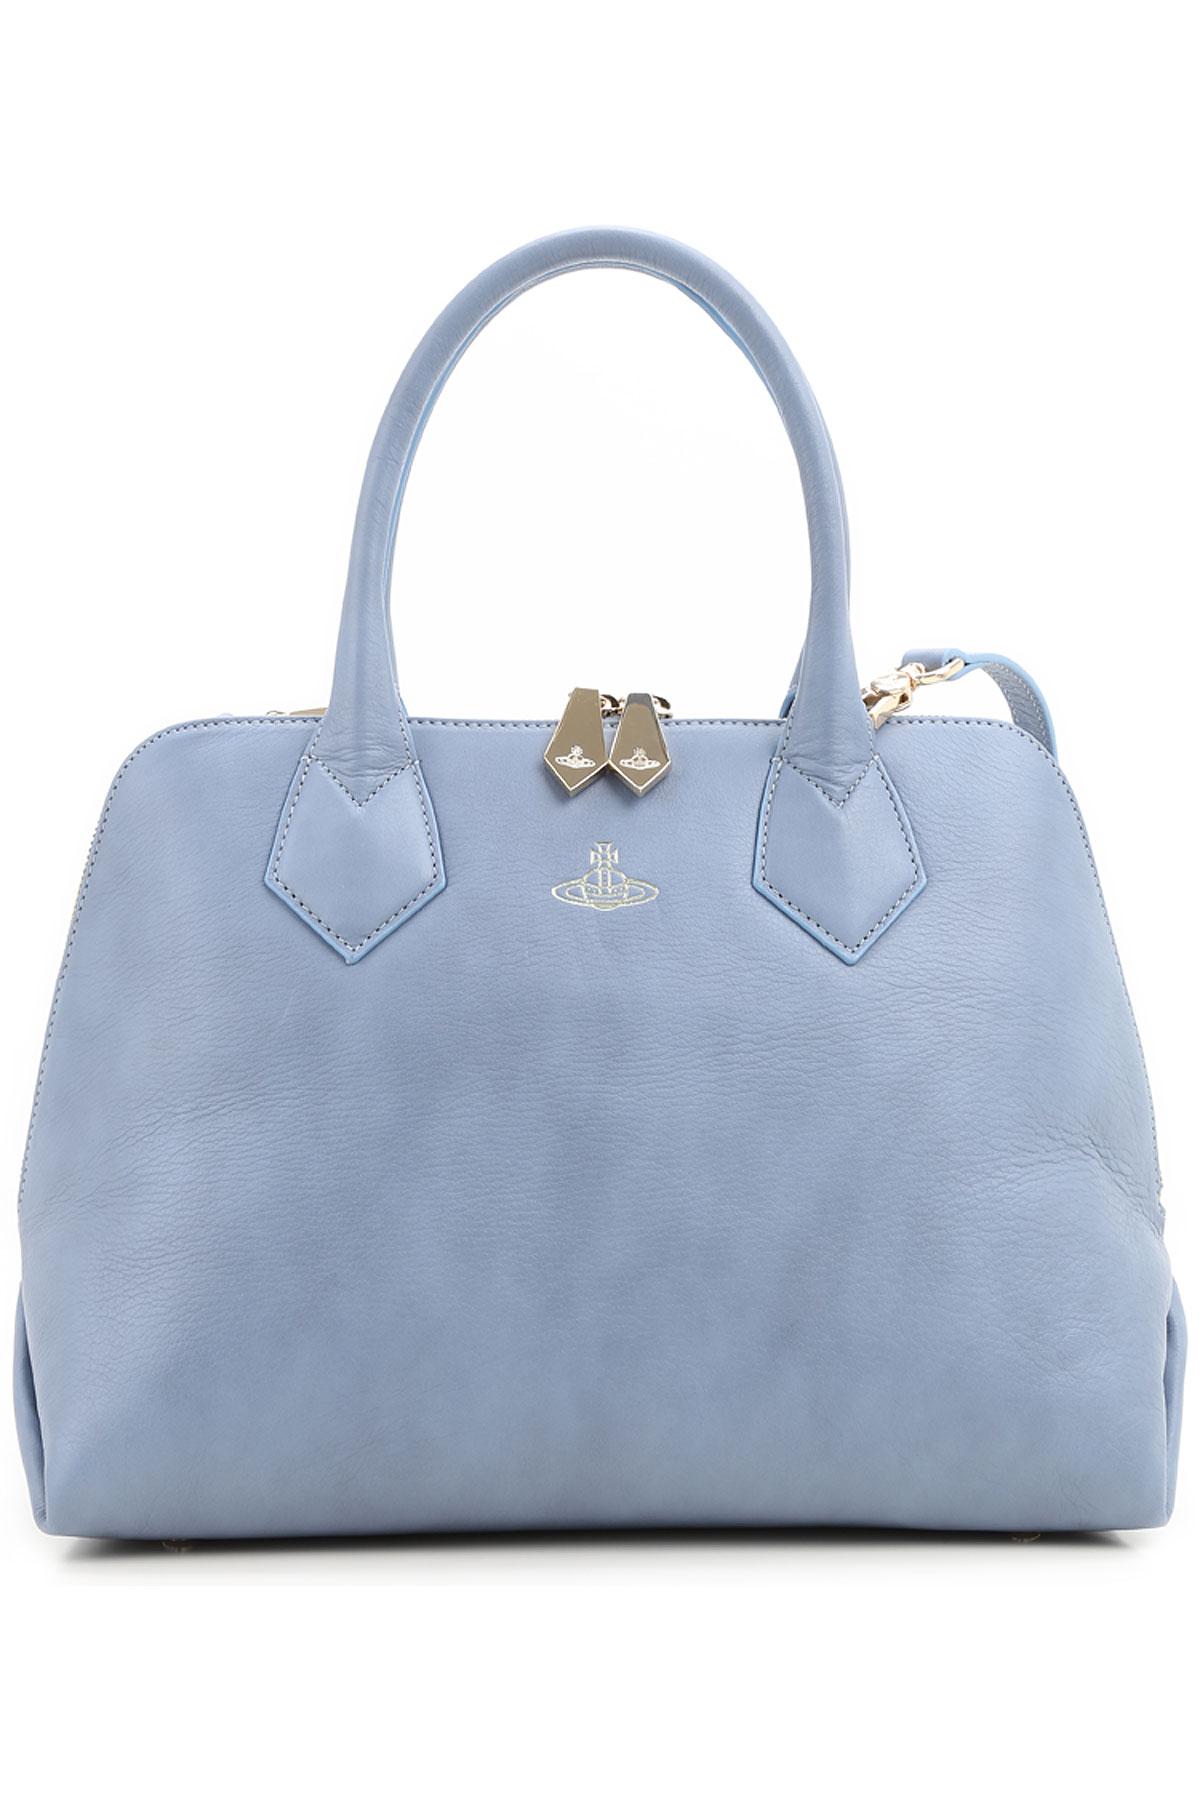 Vivienne Westwood Top Handle Handbag, Azure, Leather, 2017 USA-362267